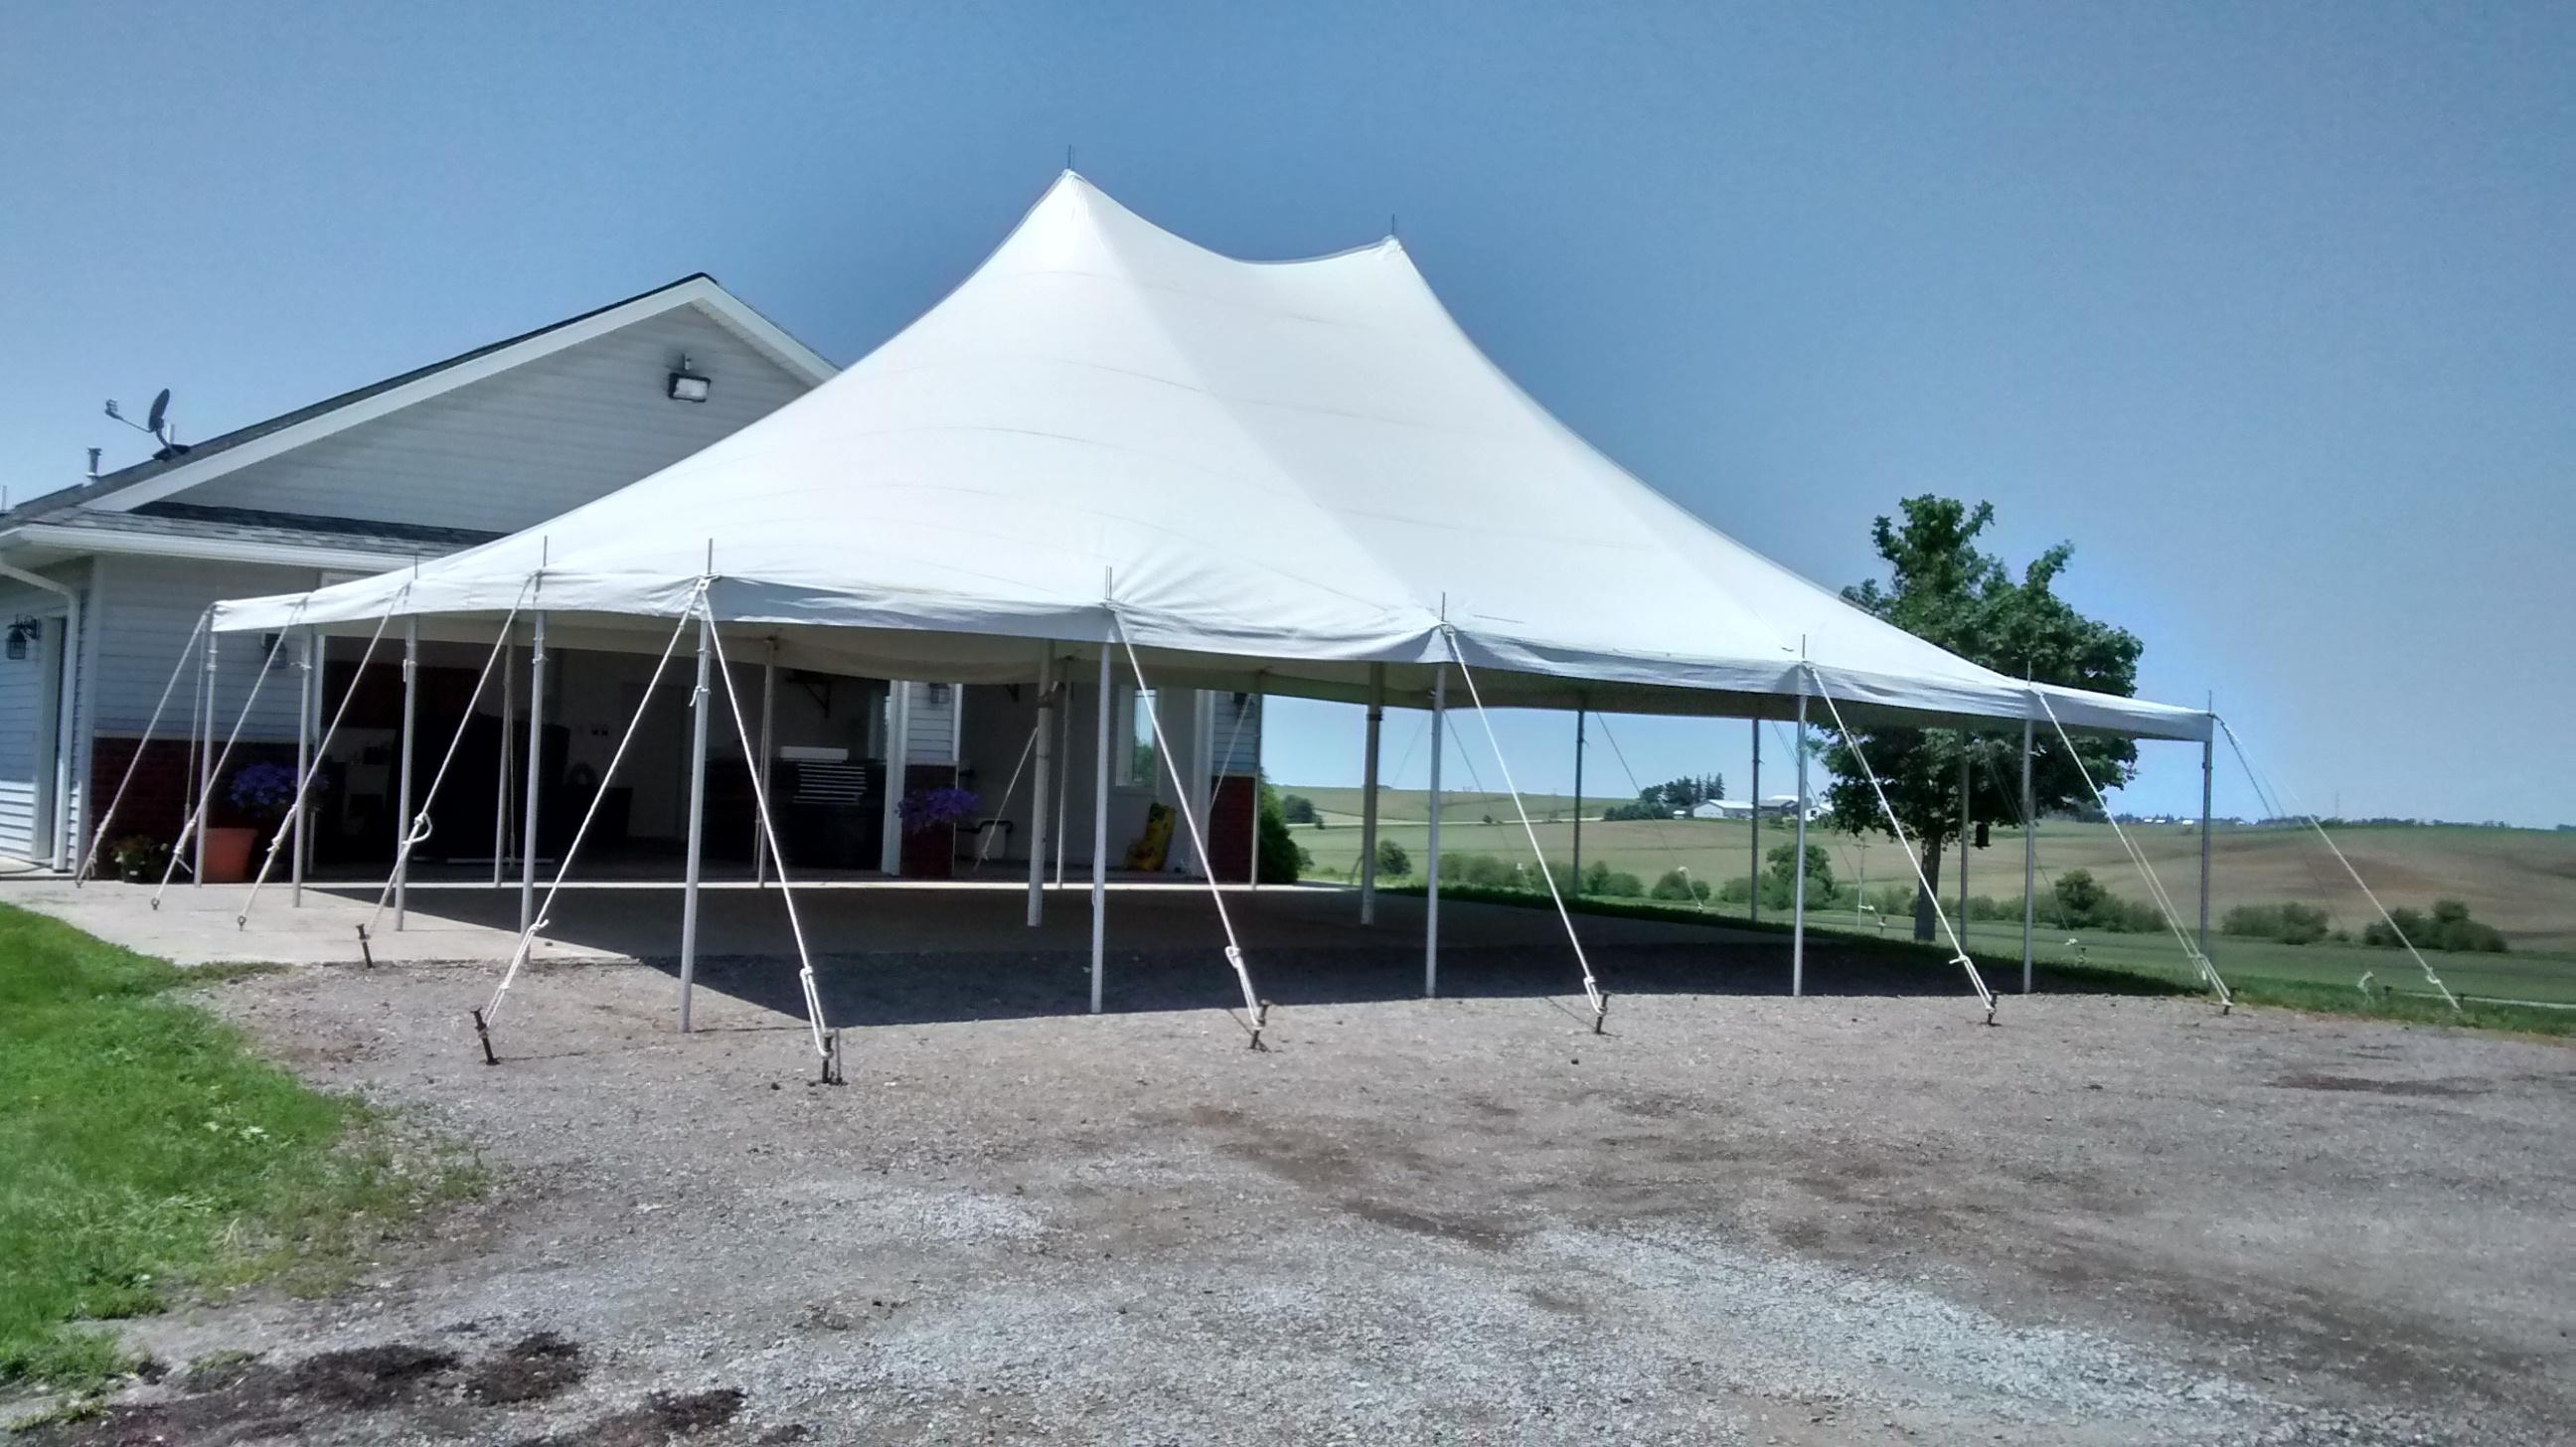 30u2032 x 40u2032 rope and pole tent set-up in Williamsburg Iowa & 30u0027 x 40u0027 Rope and Pole Tent Rental in Iowa City Cedar Rapids